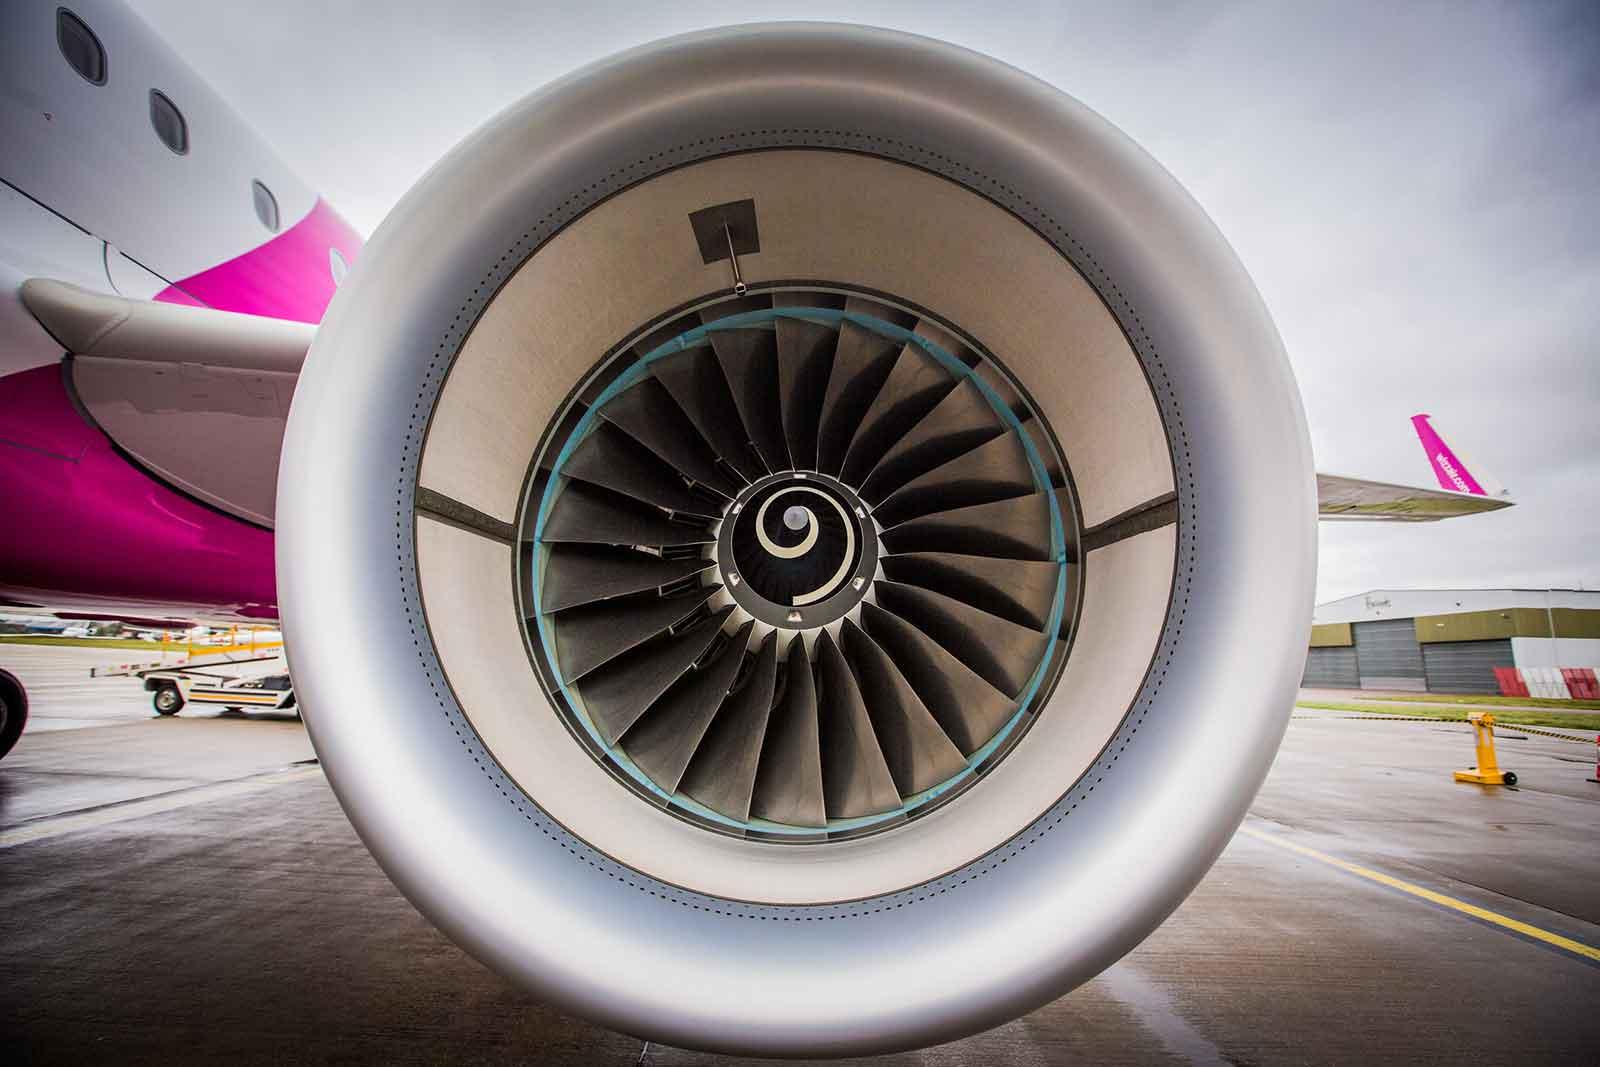 Wizz Air Airbus A321ceo Engine